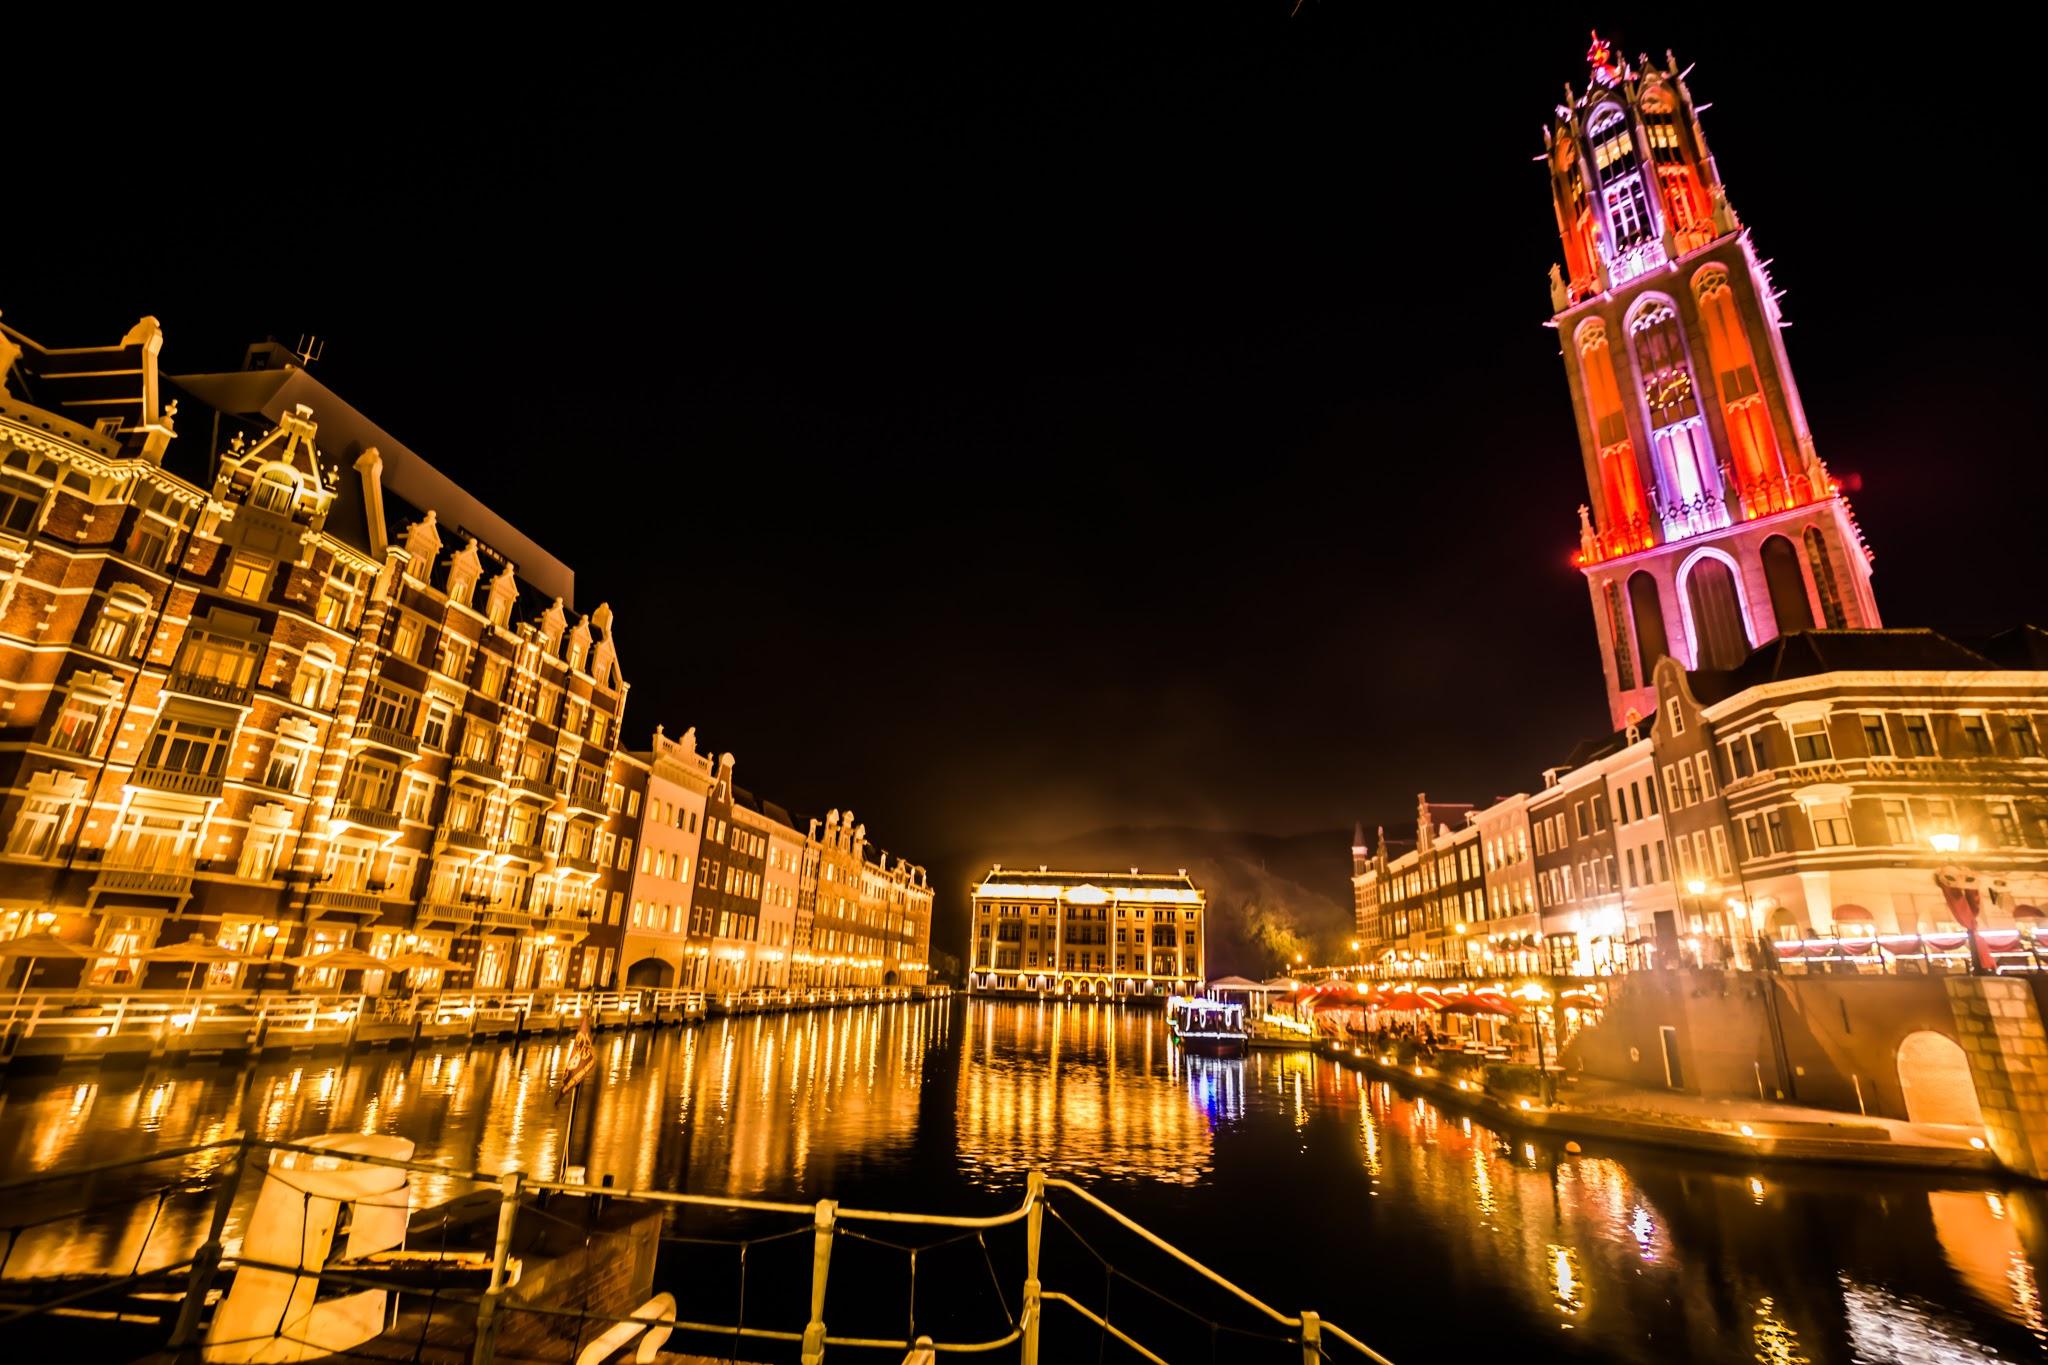 Huis Ten Bosch illumination Kingdom of light Hotel Europe and Domtoren1